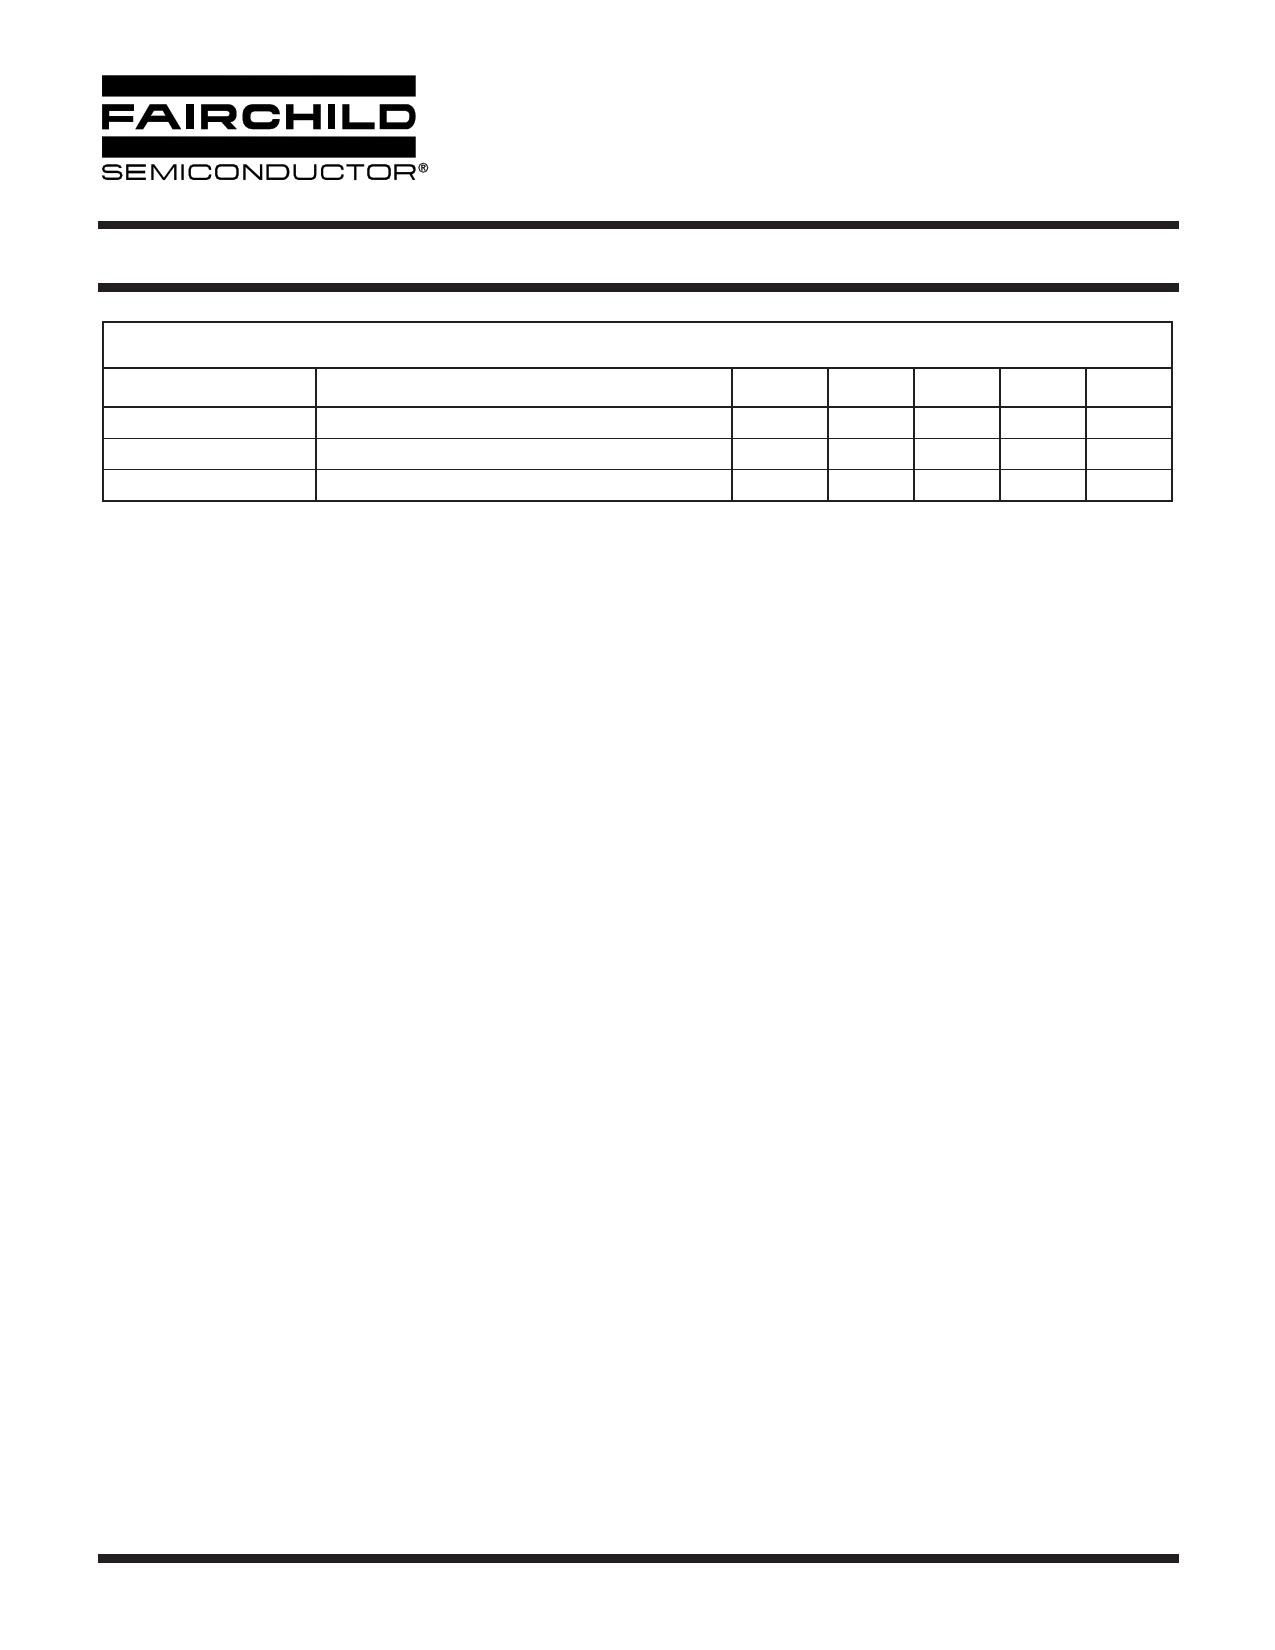 H11-C1 pdf, 반도체, 판매, 대치품